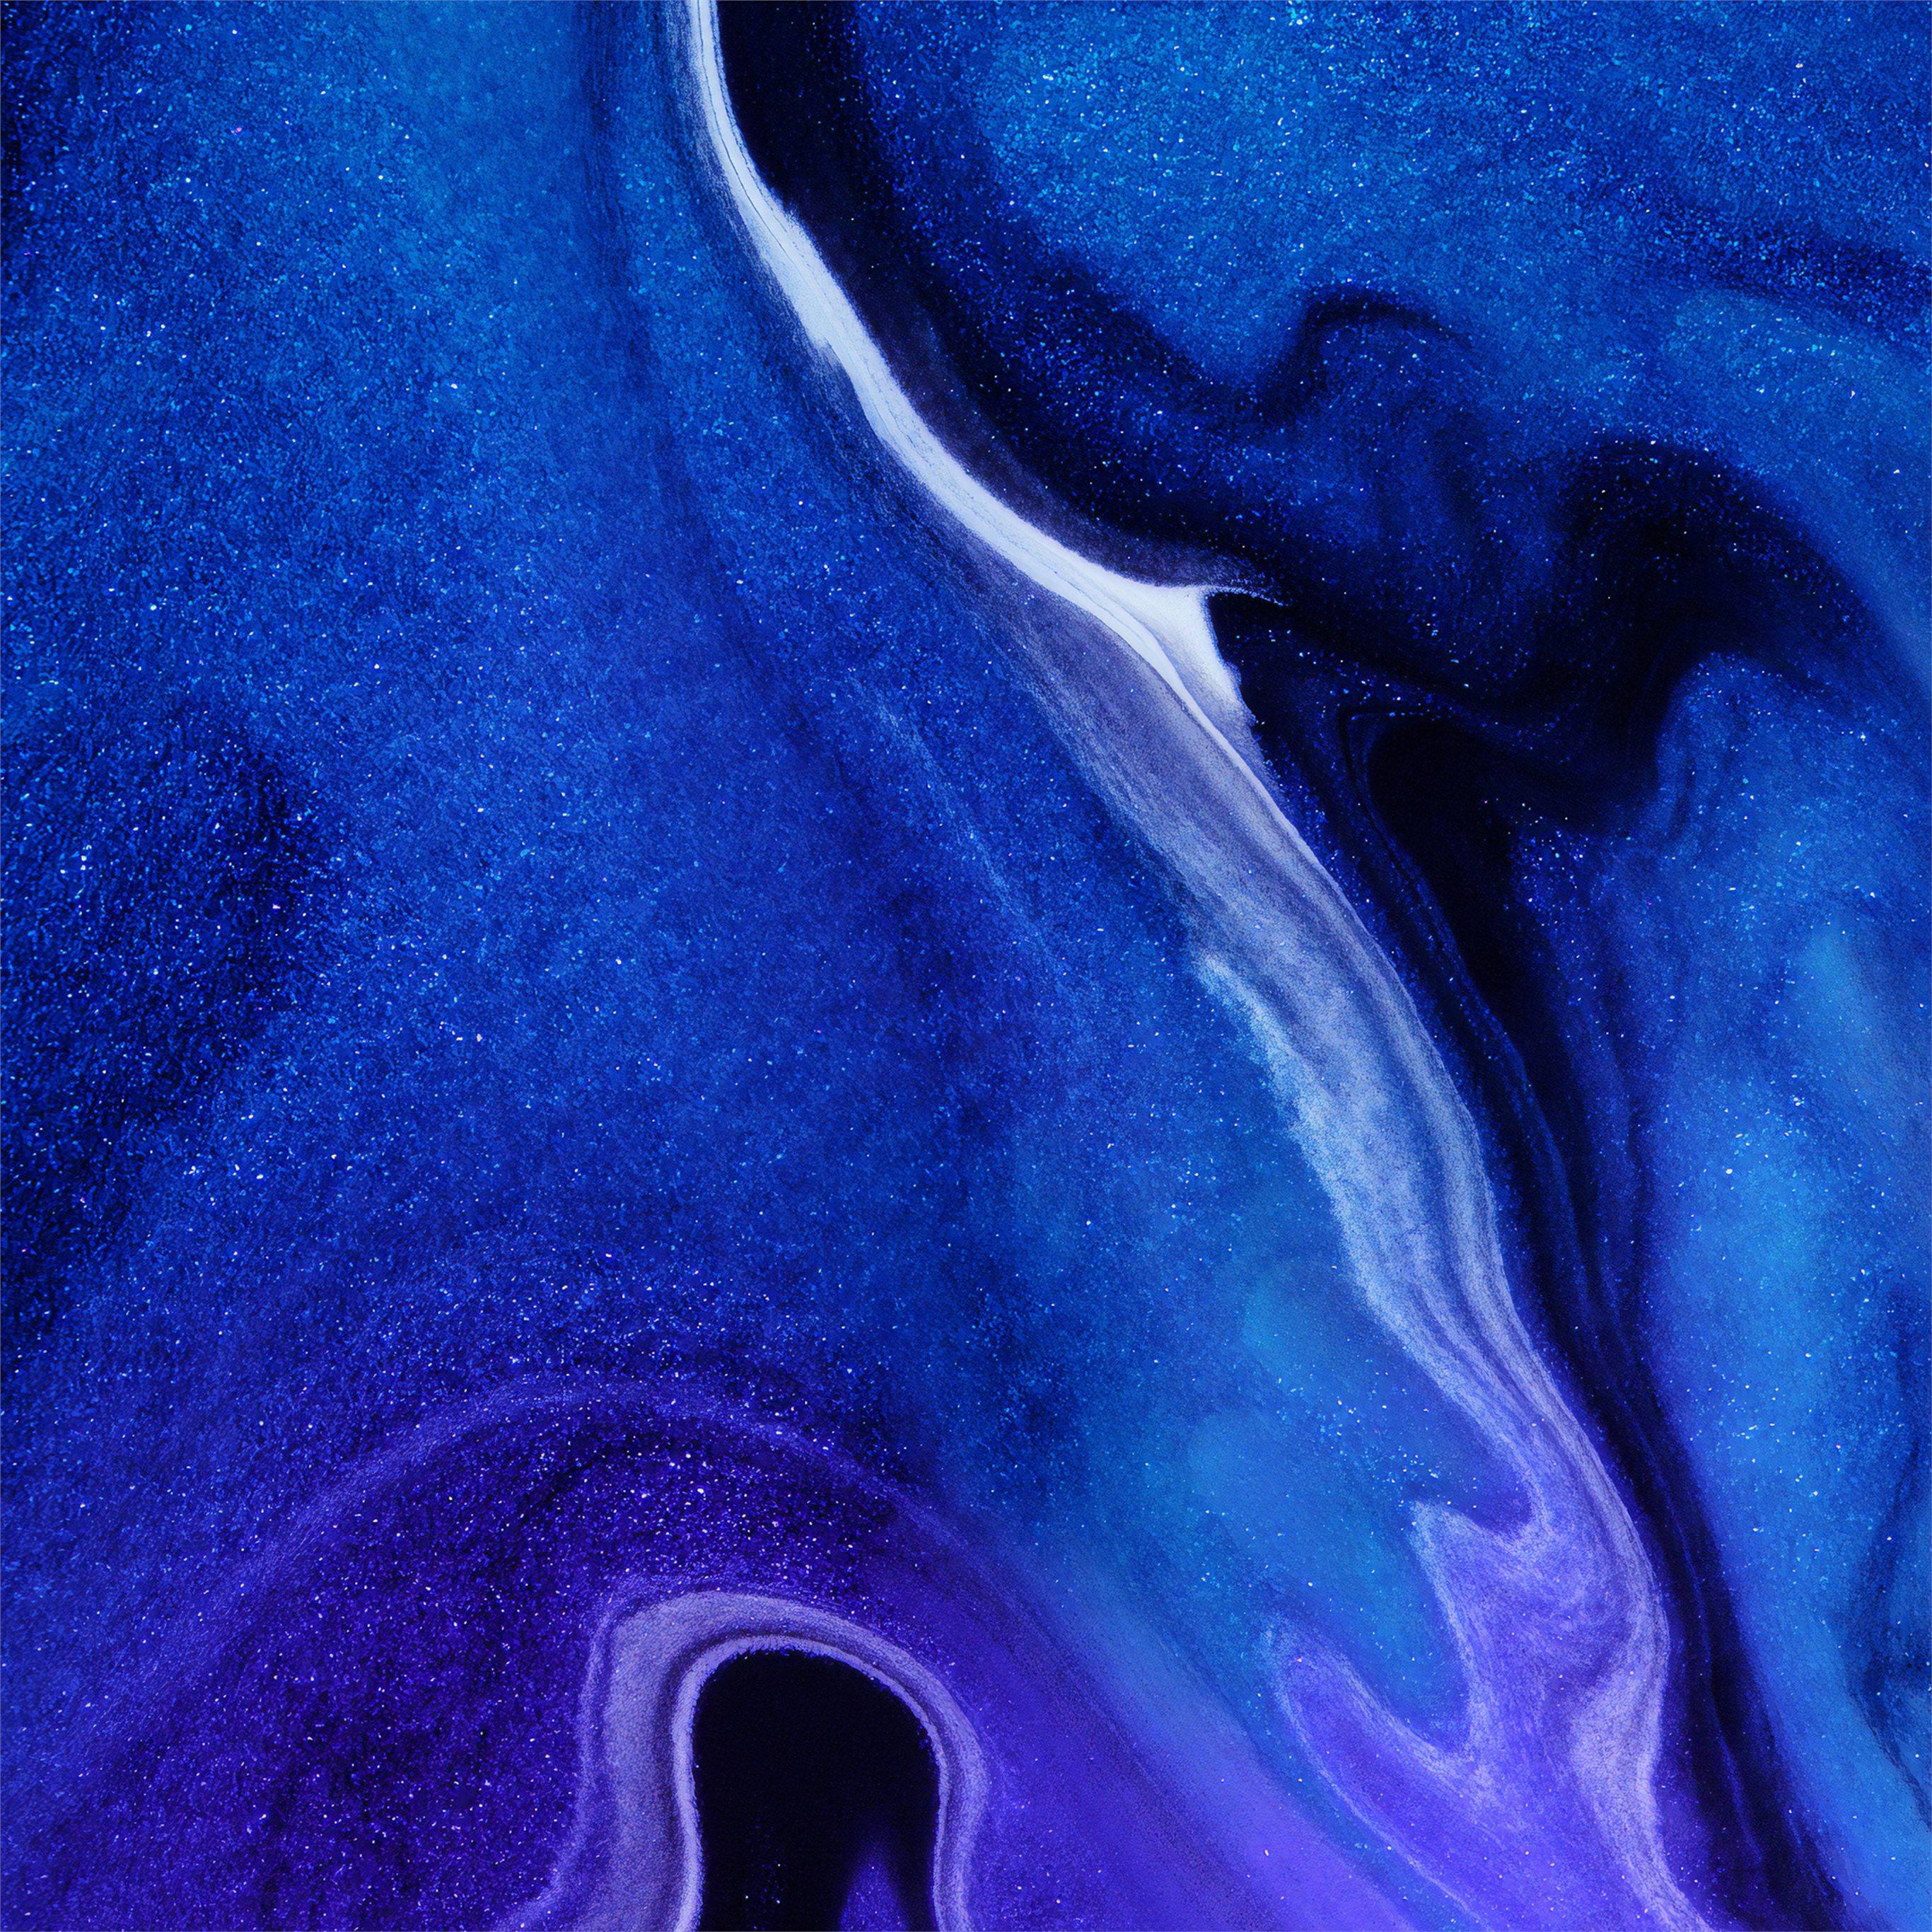 Dark Blue Color Burst 4k Ipad Air Wallpapers Free Download